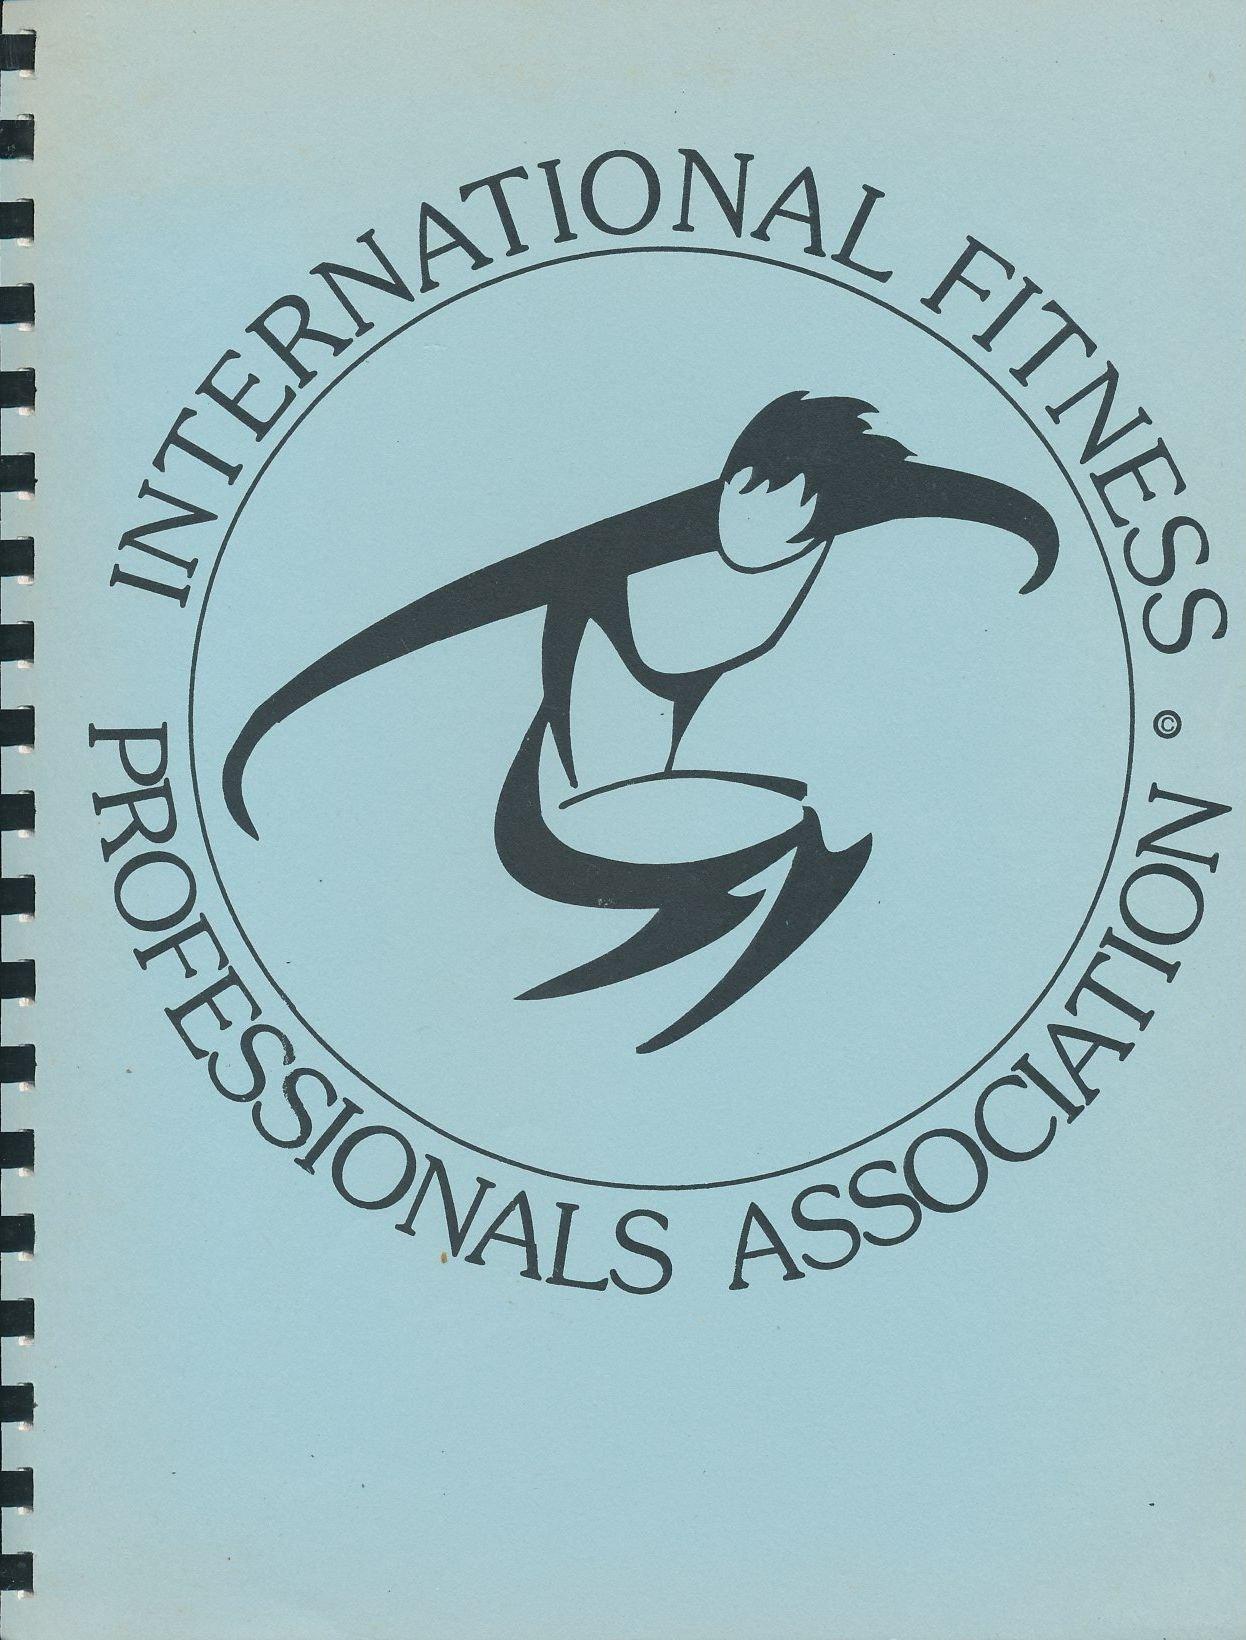 International Fitness Professionals Association: Sports